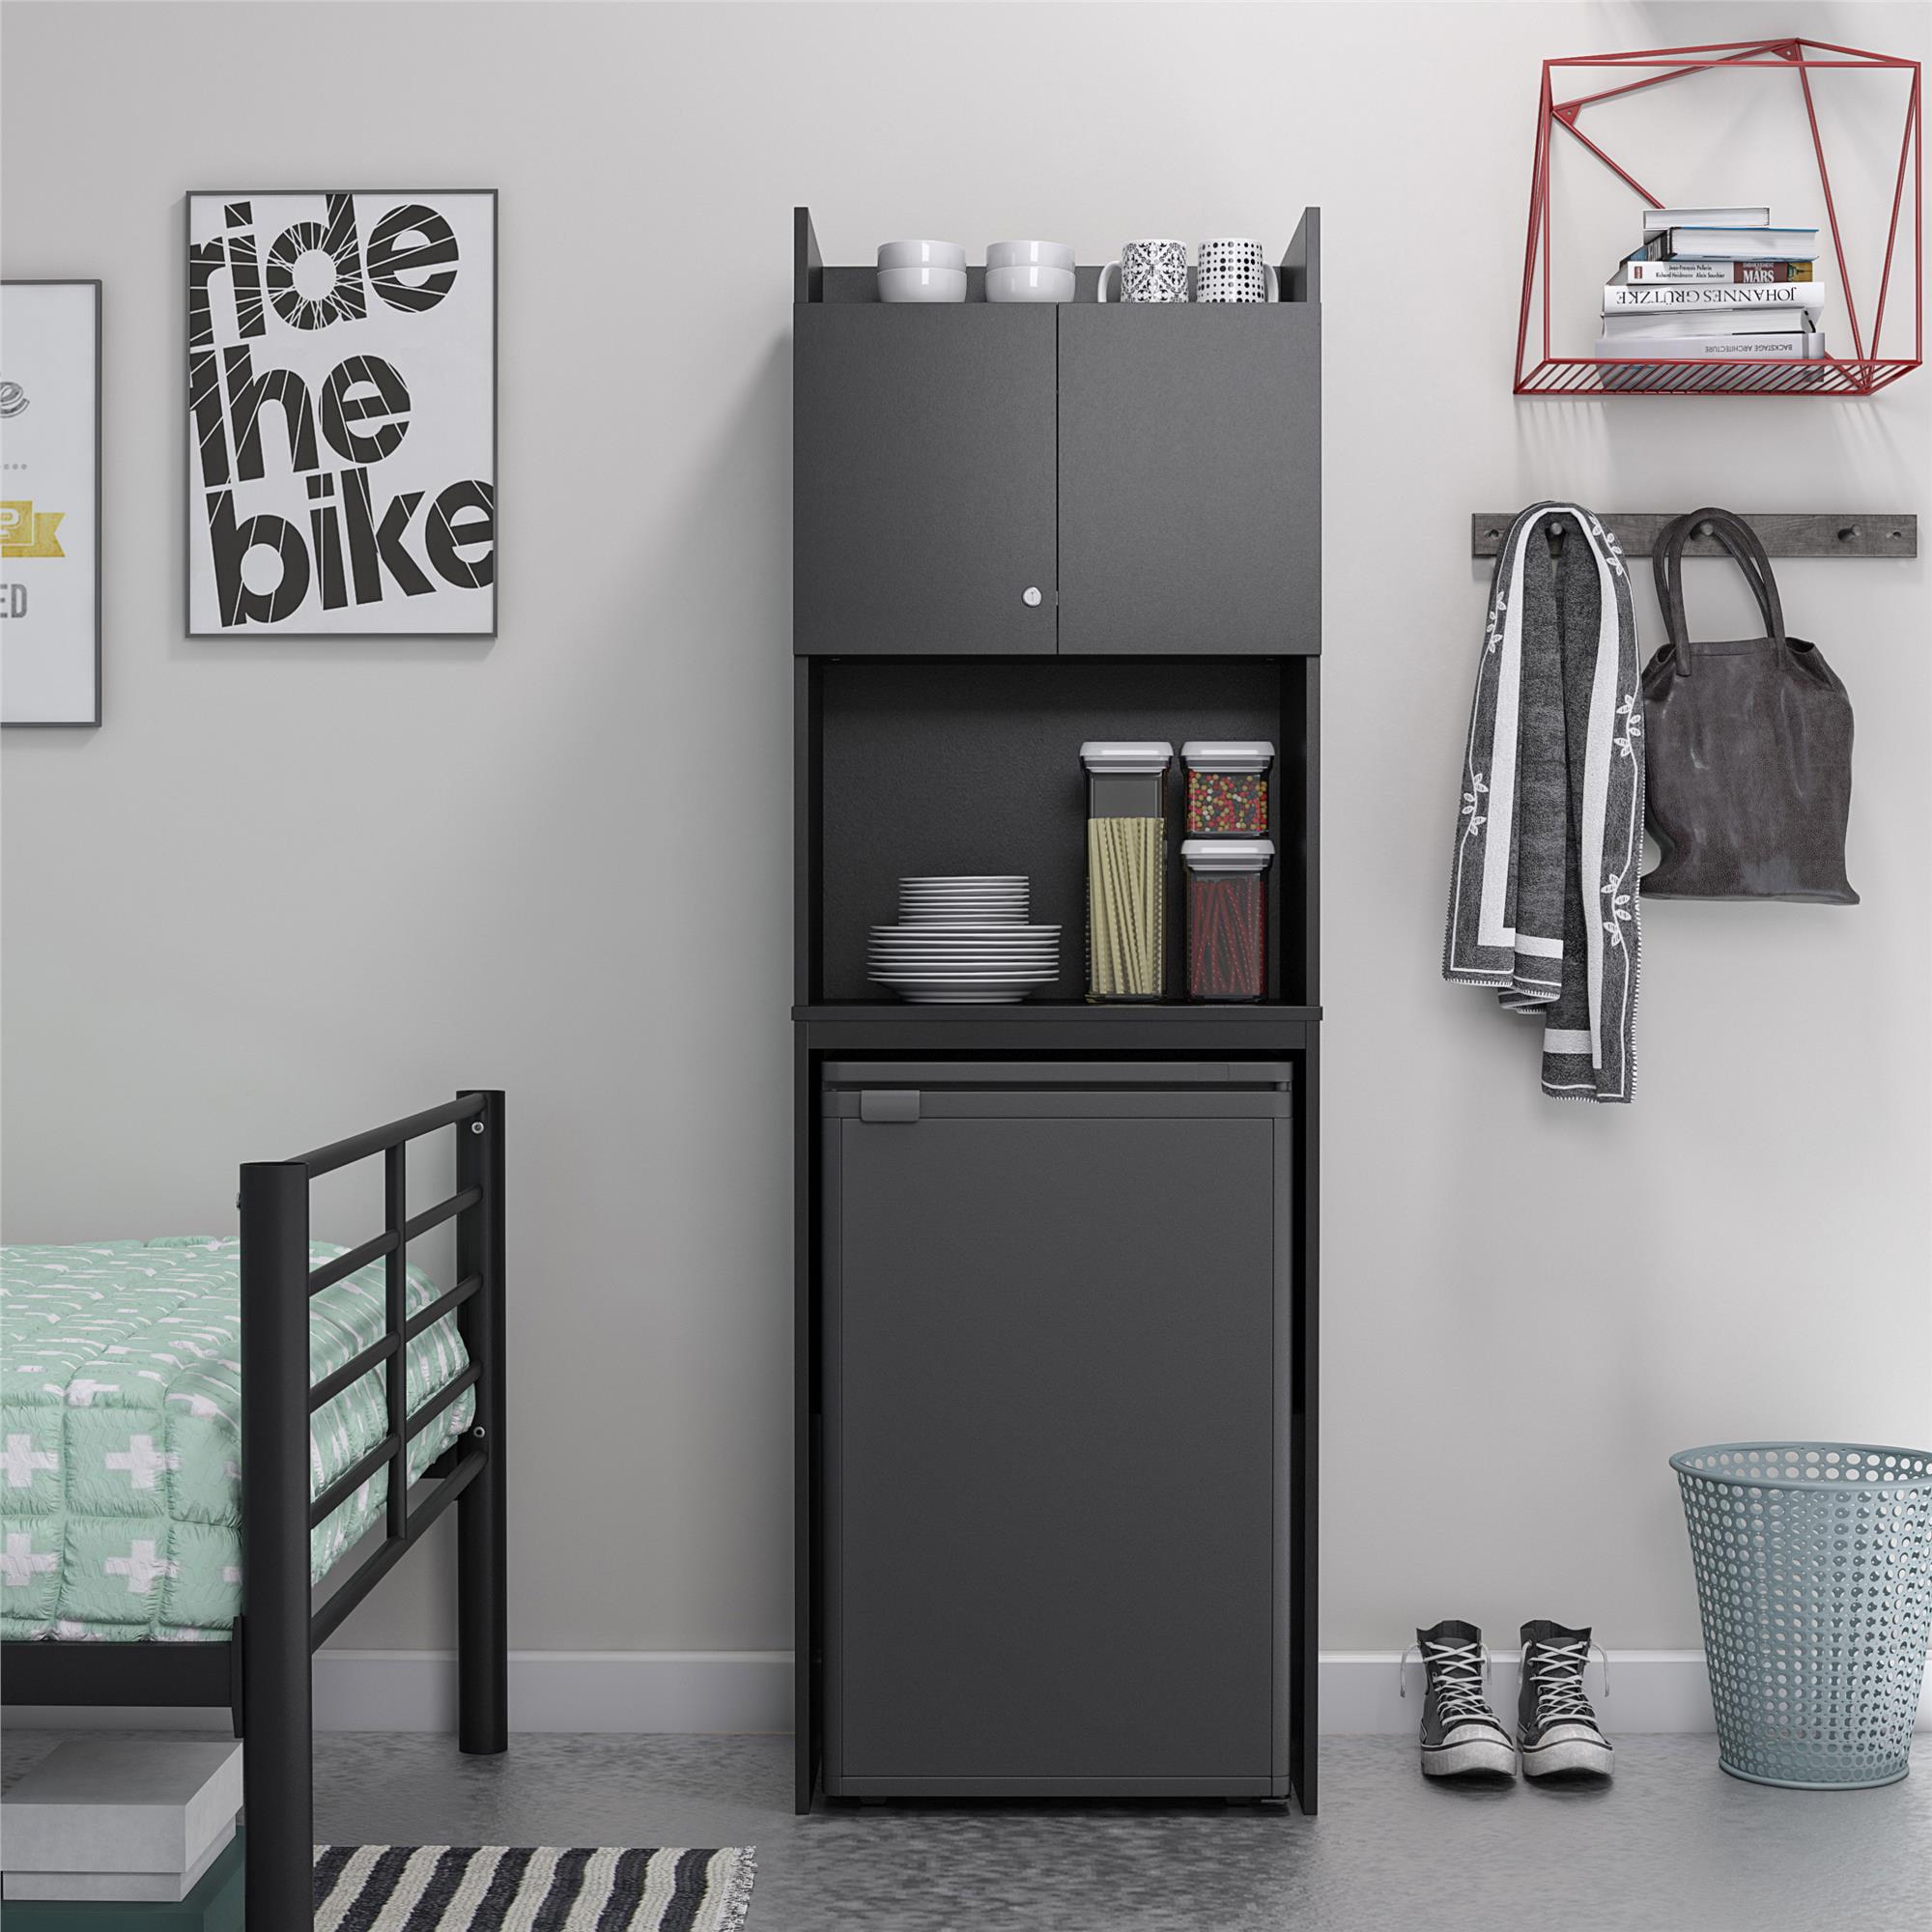 Systembuild Clarkson Mini Refrigerator, Mini Fridge Cabinet For Dorm Room